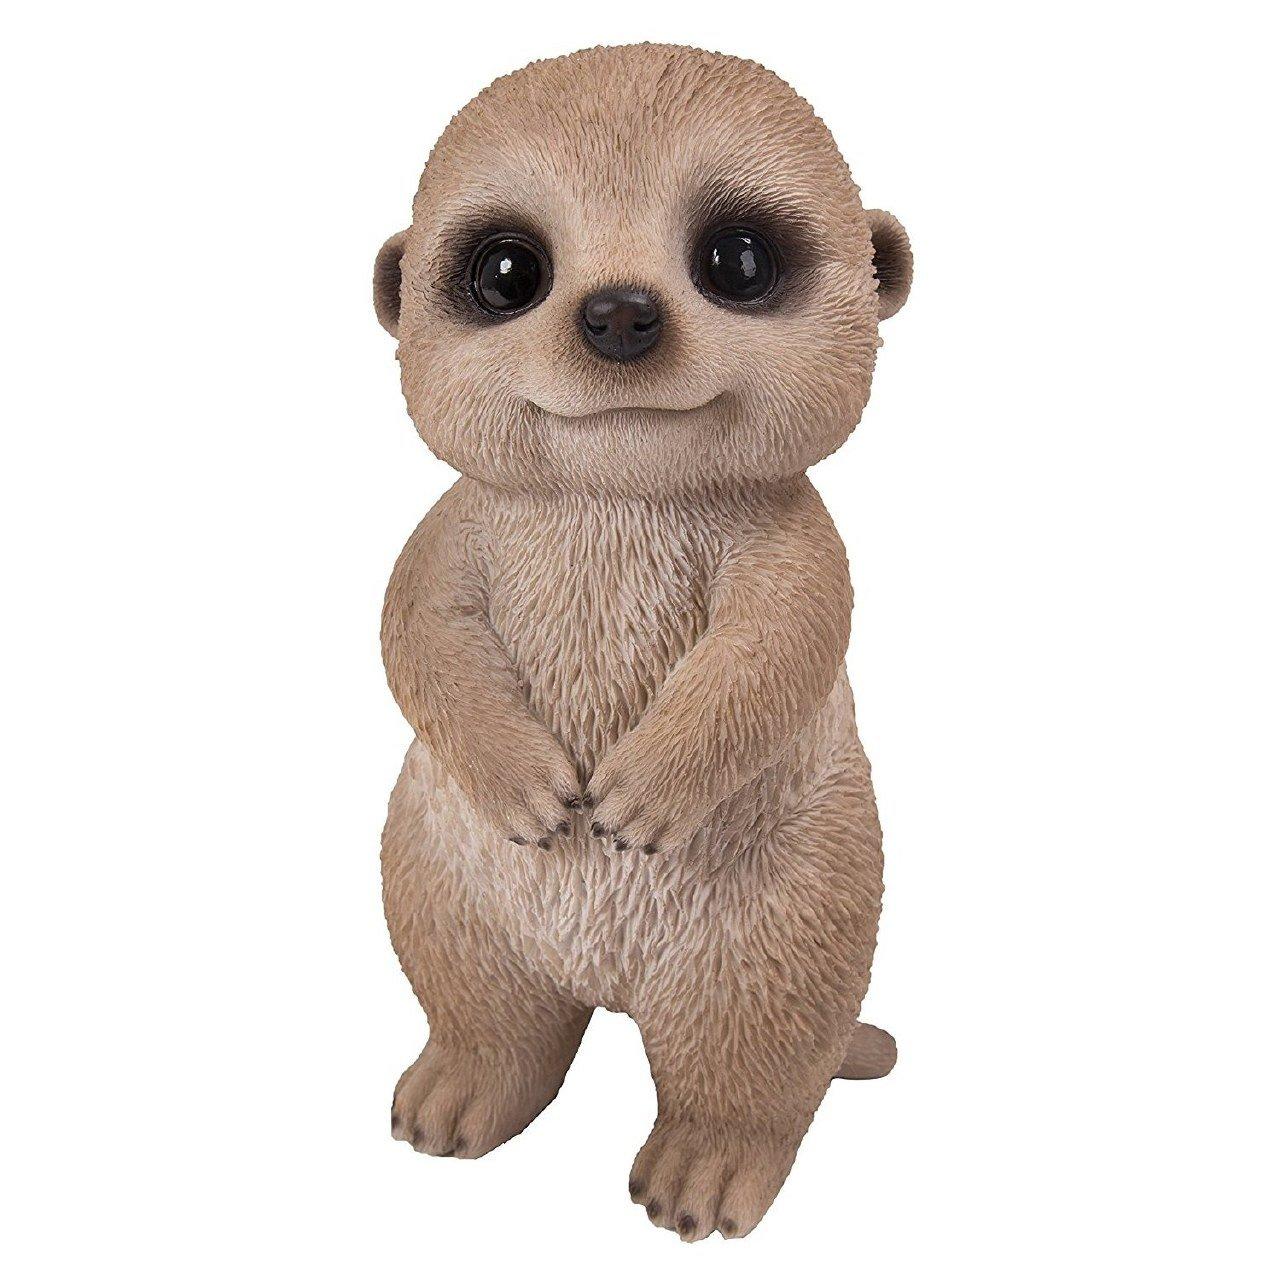 Vivid Arts Pet Pal Baby Meerkat